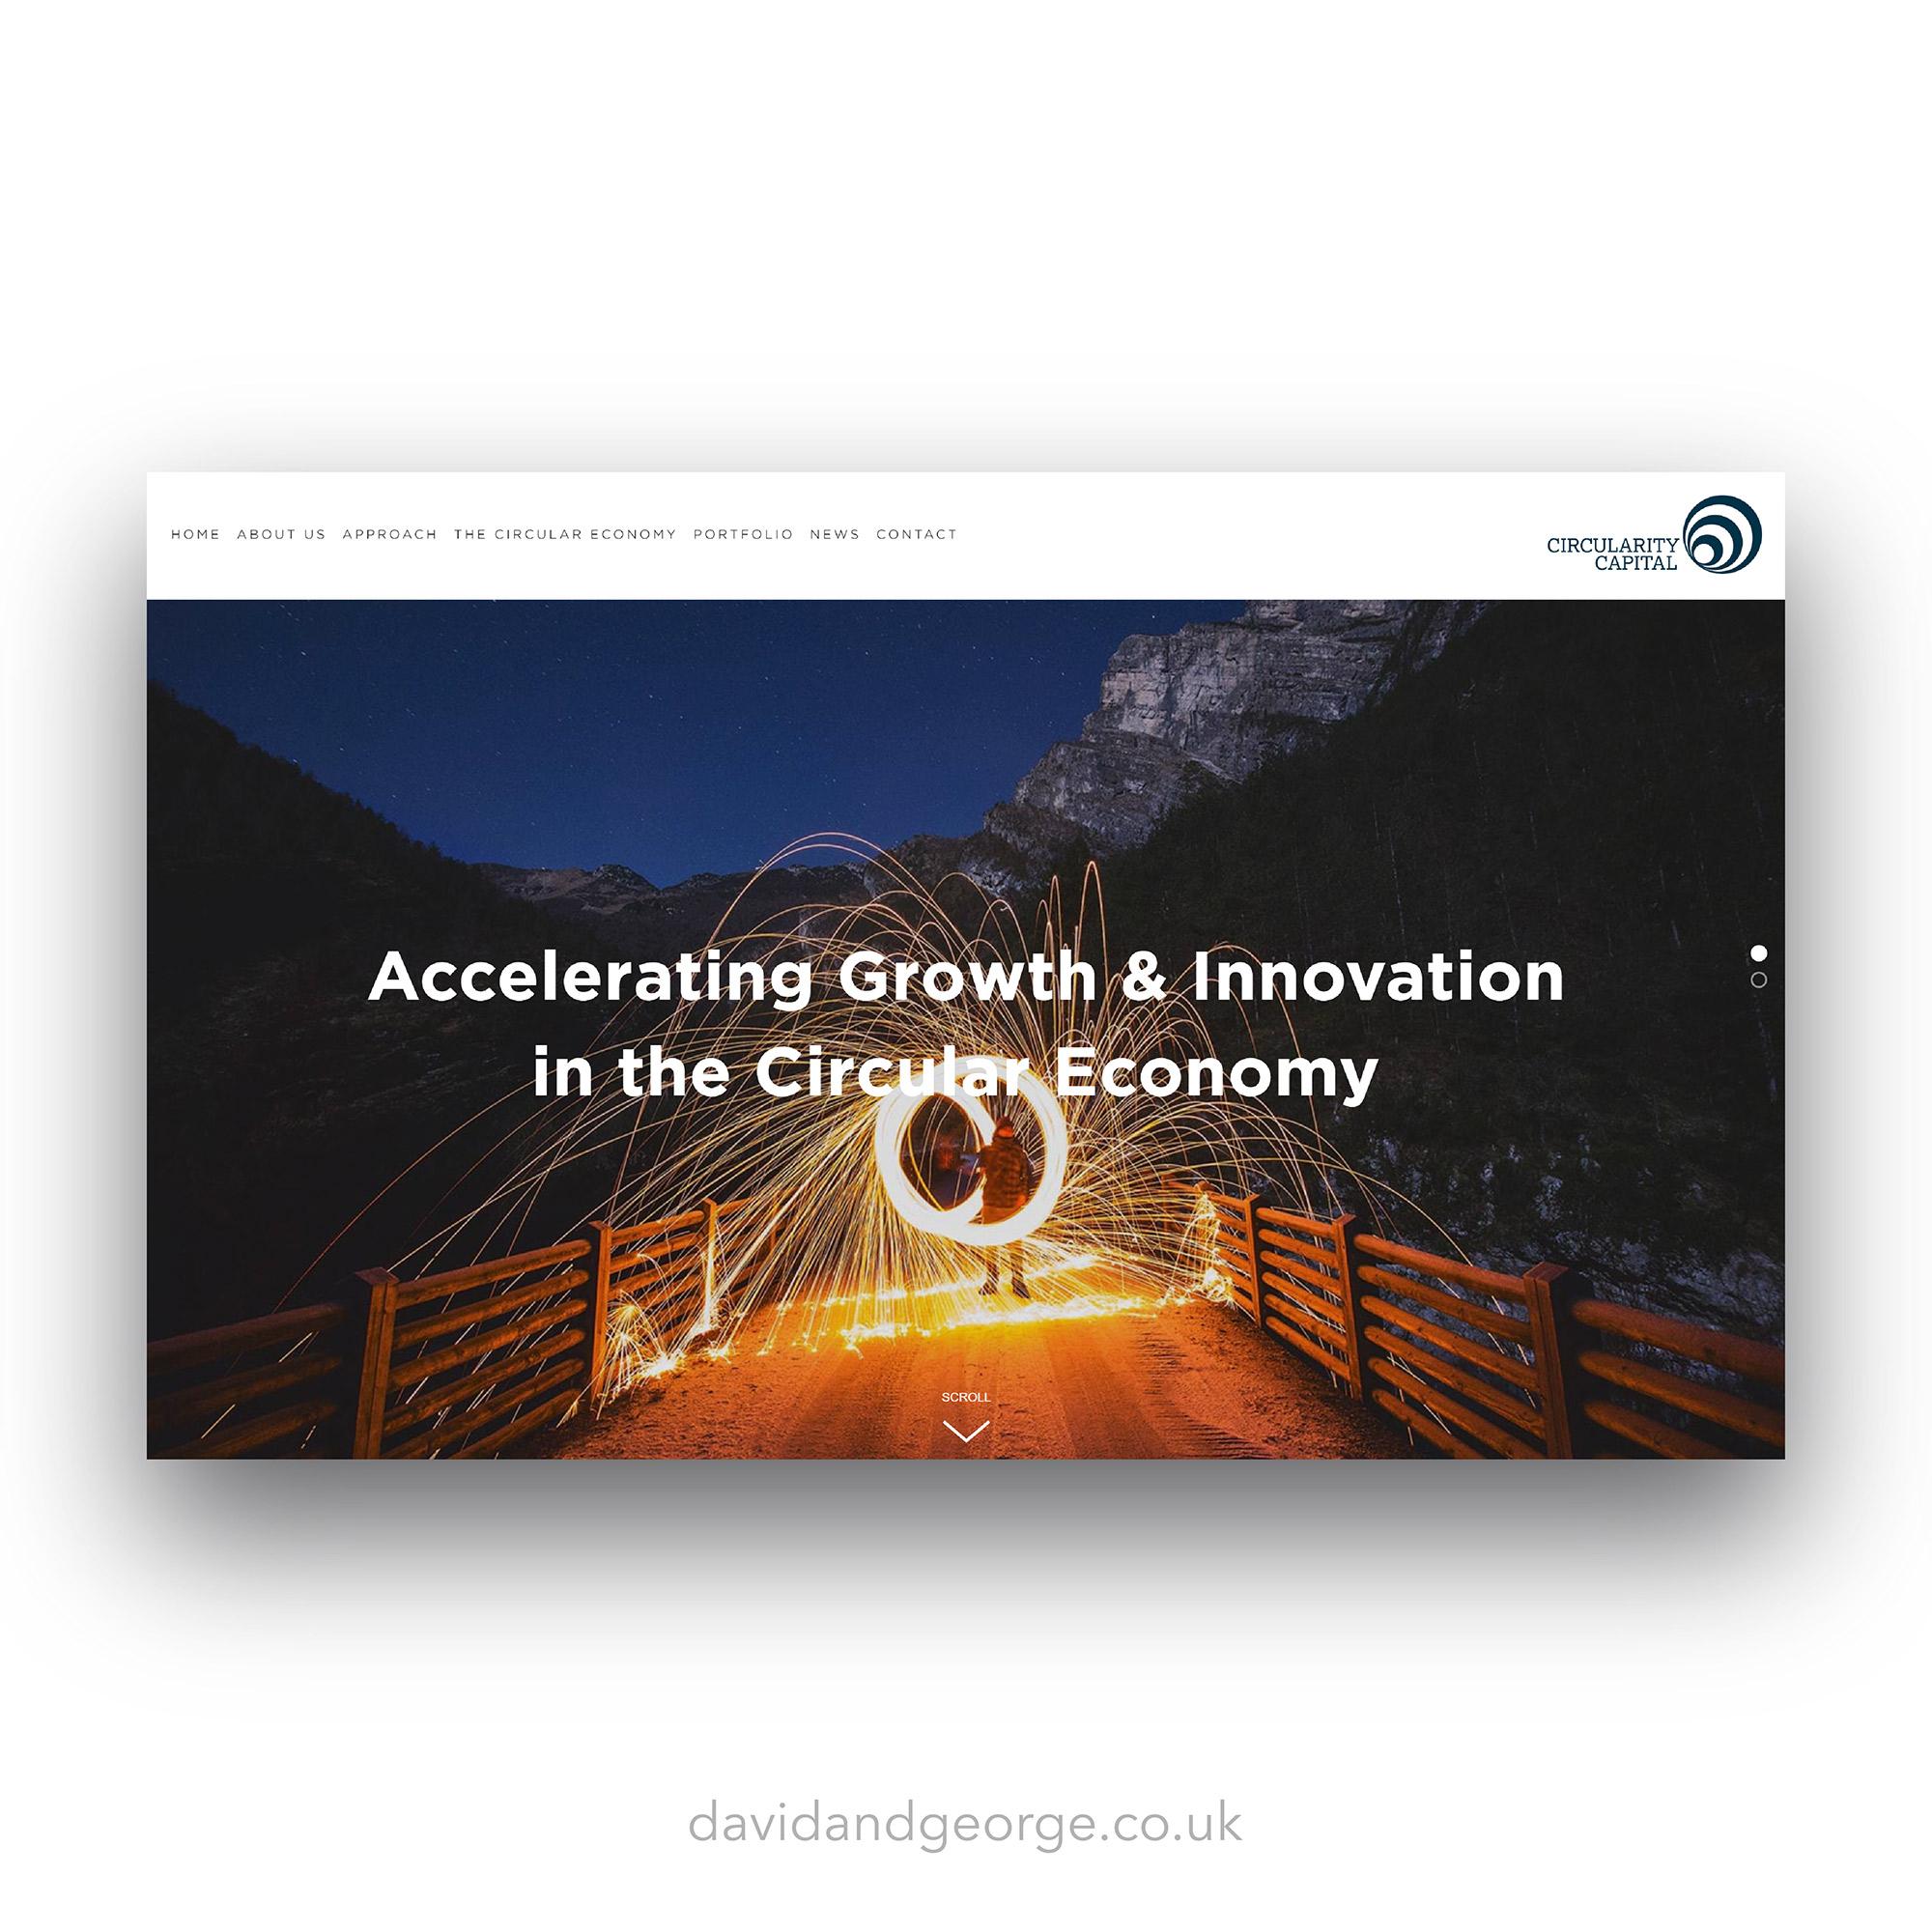 squarespace-website-design-london-edinburgh-uk-david-and-george-circularity-capital-finance-investment-fund.jpg